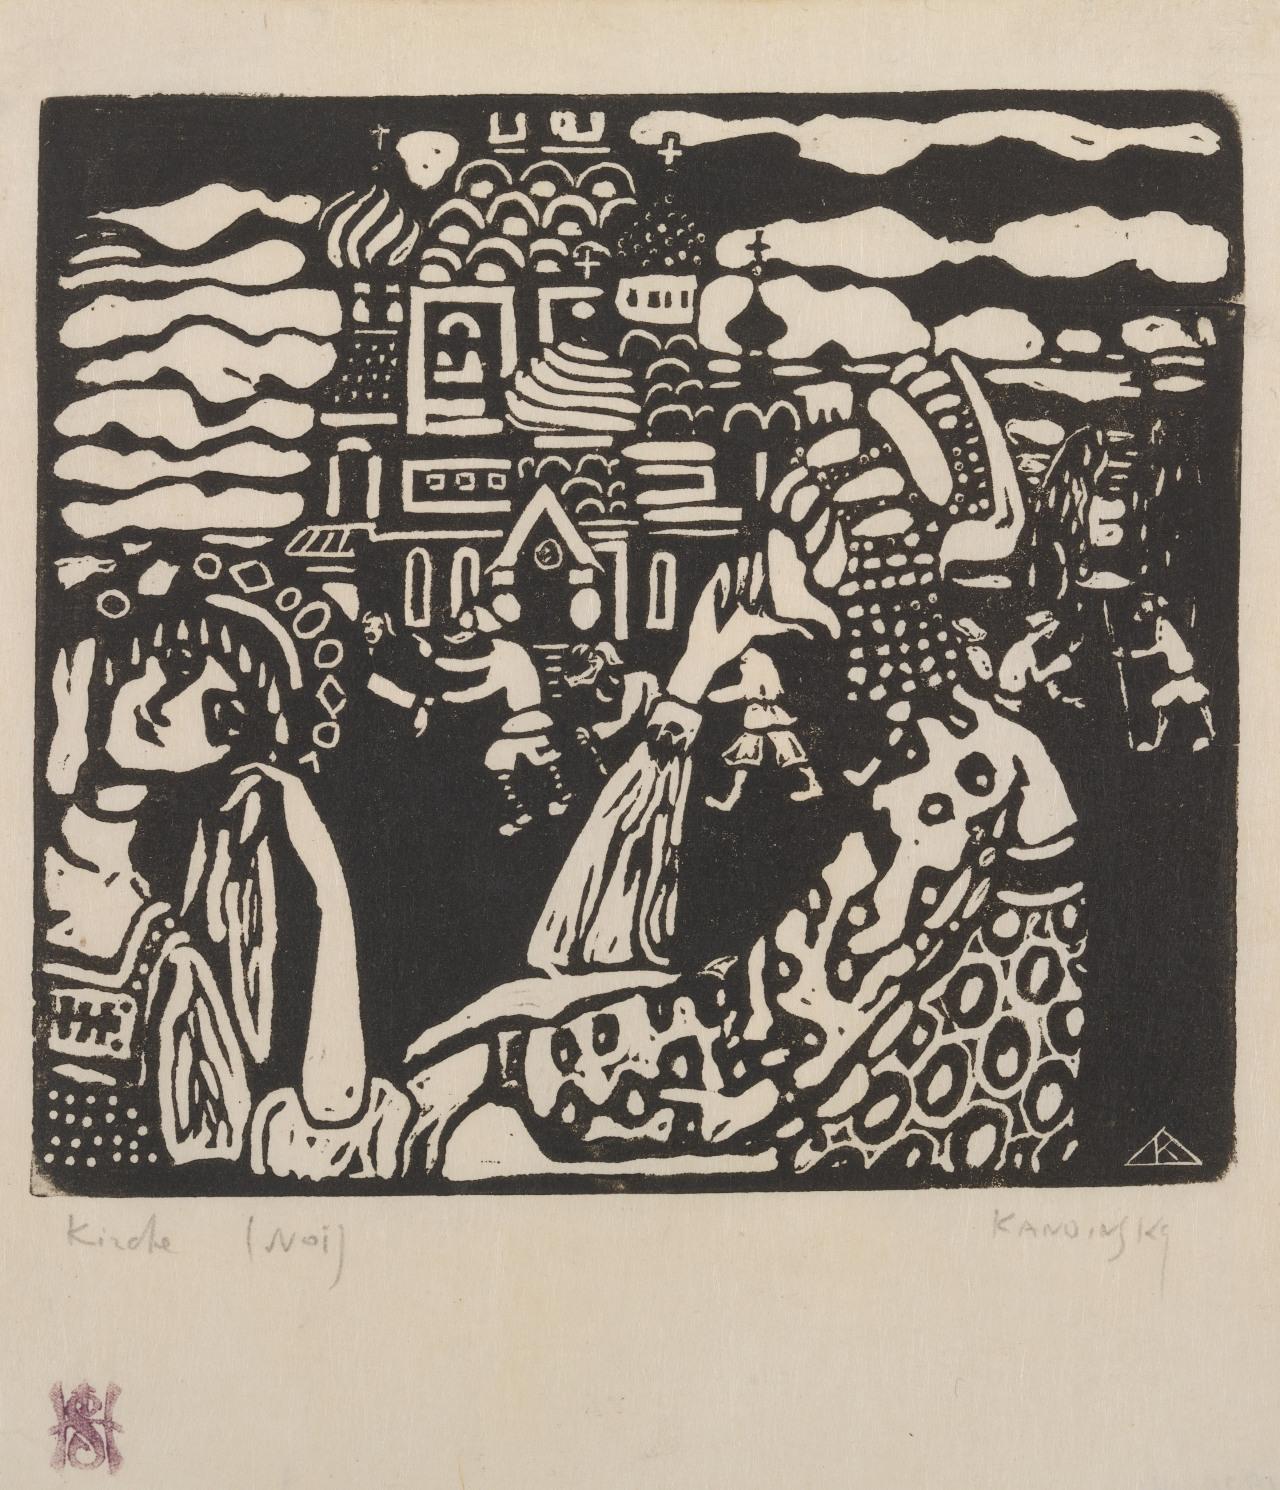 "guggenheim-art:"" Church by Vasily Kandinsky by Guggenheim MuseumSize: 13.3x14.7 cmMedium: WoodcutThe Hilla von Rebay Foundation, On extended loan to the Solomon R. Guggenheim Museum, New York © 2014 Artists Rights Society (ARS), New York/ADAGP,..."